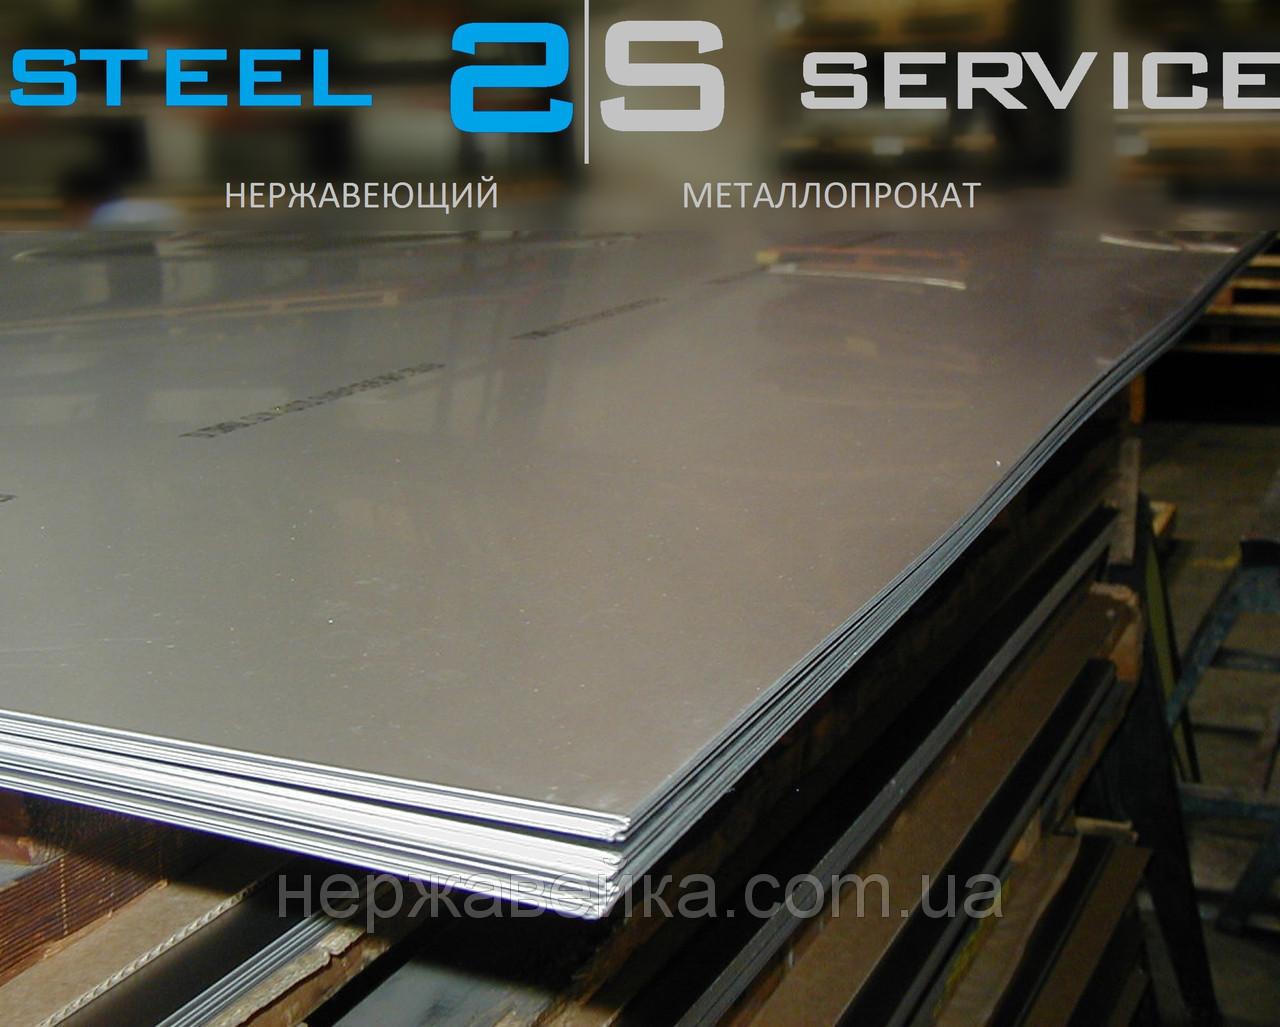 Нержавейка лист 12х1500х6000мм  AISI 316L(03Х17Н14М3) F1 - горячекатанный,  кислотостойкий